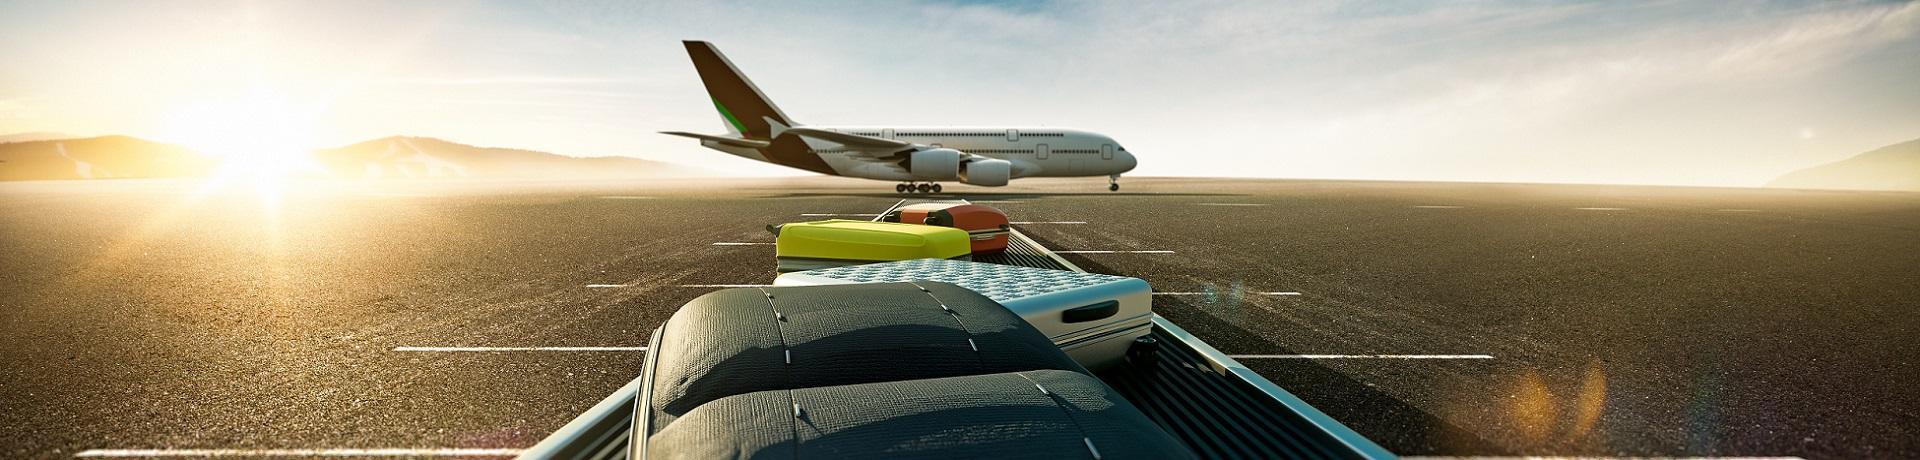 Sonstiges: Kofferband - Flugzeug - Emotion